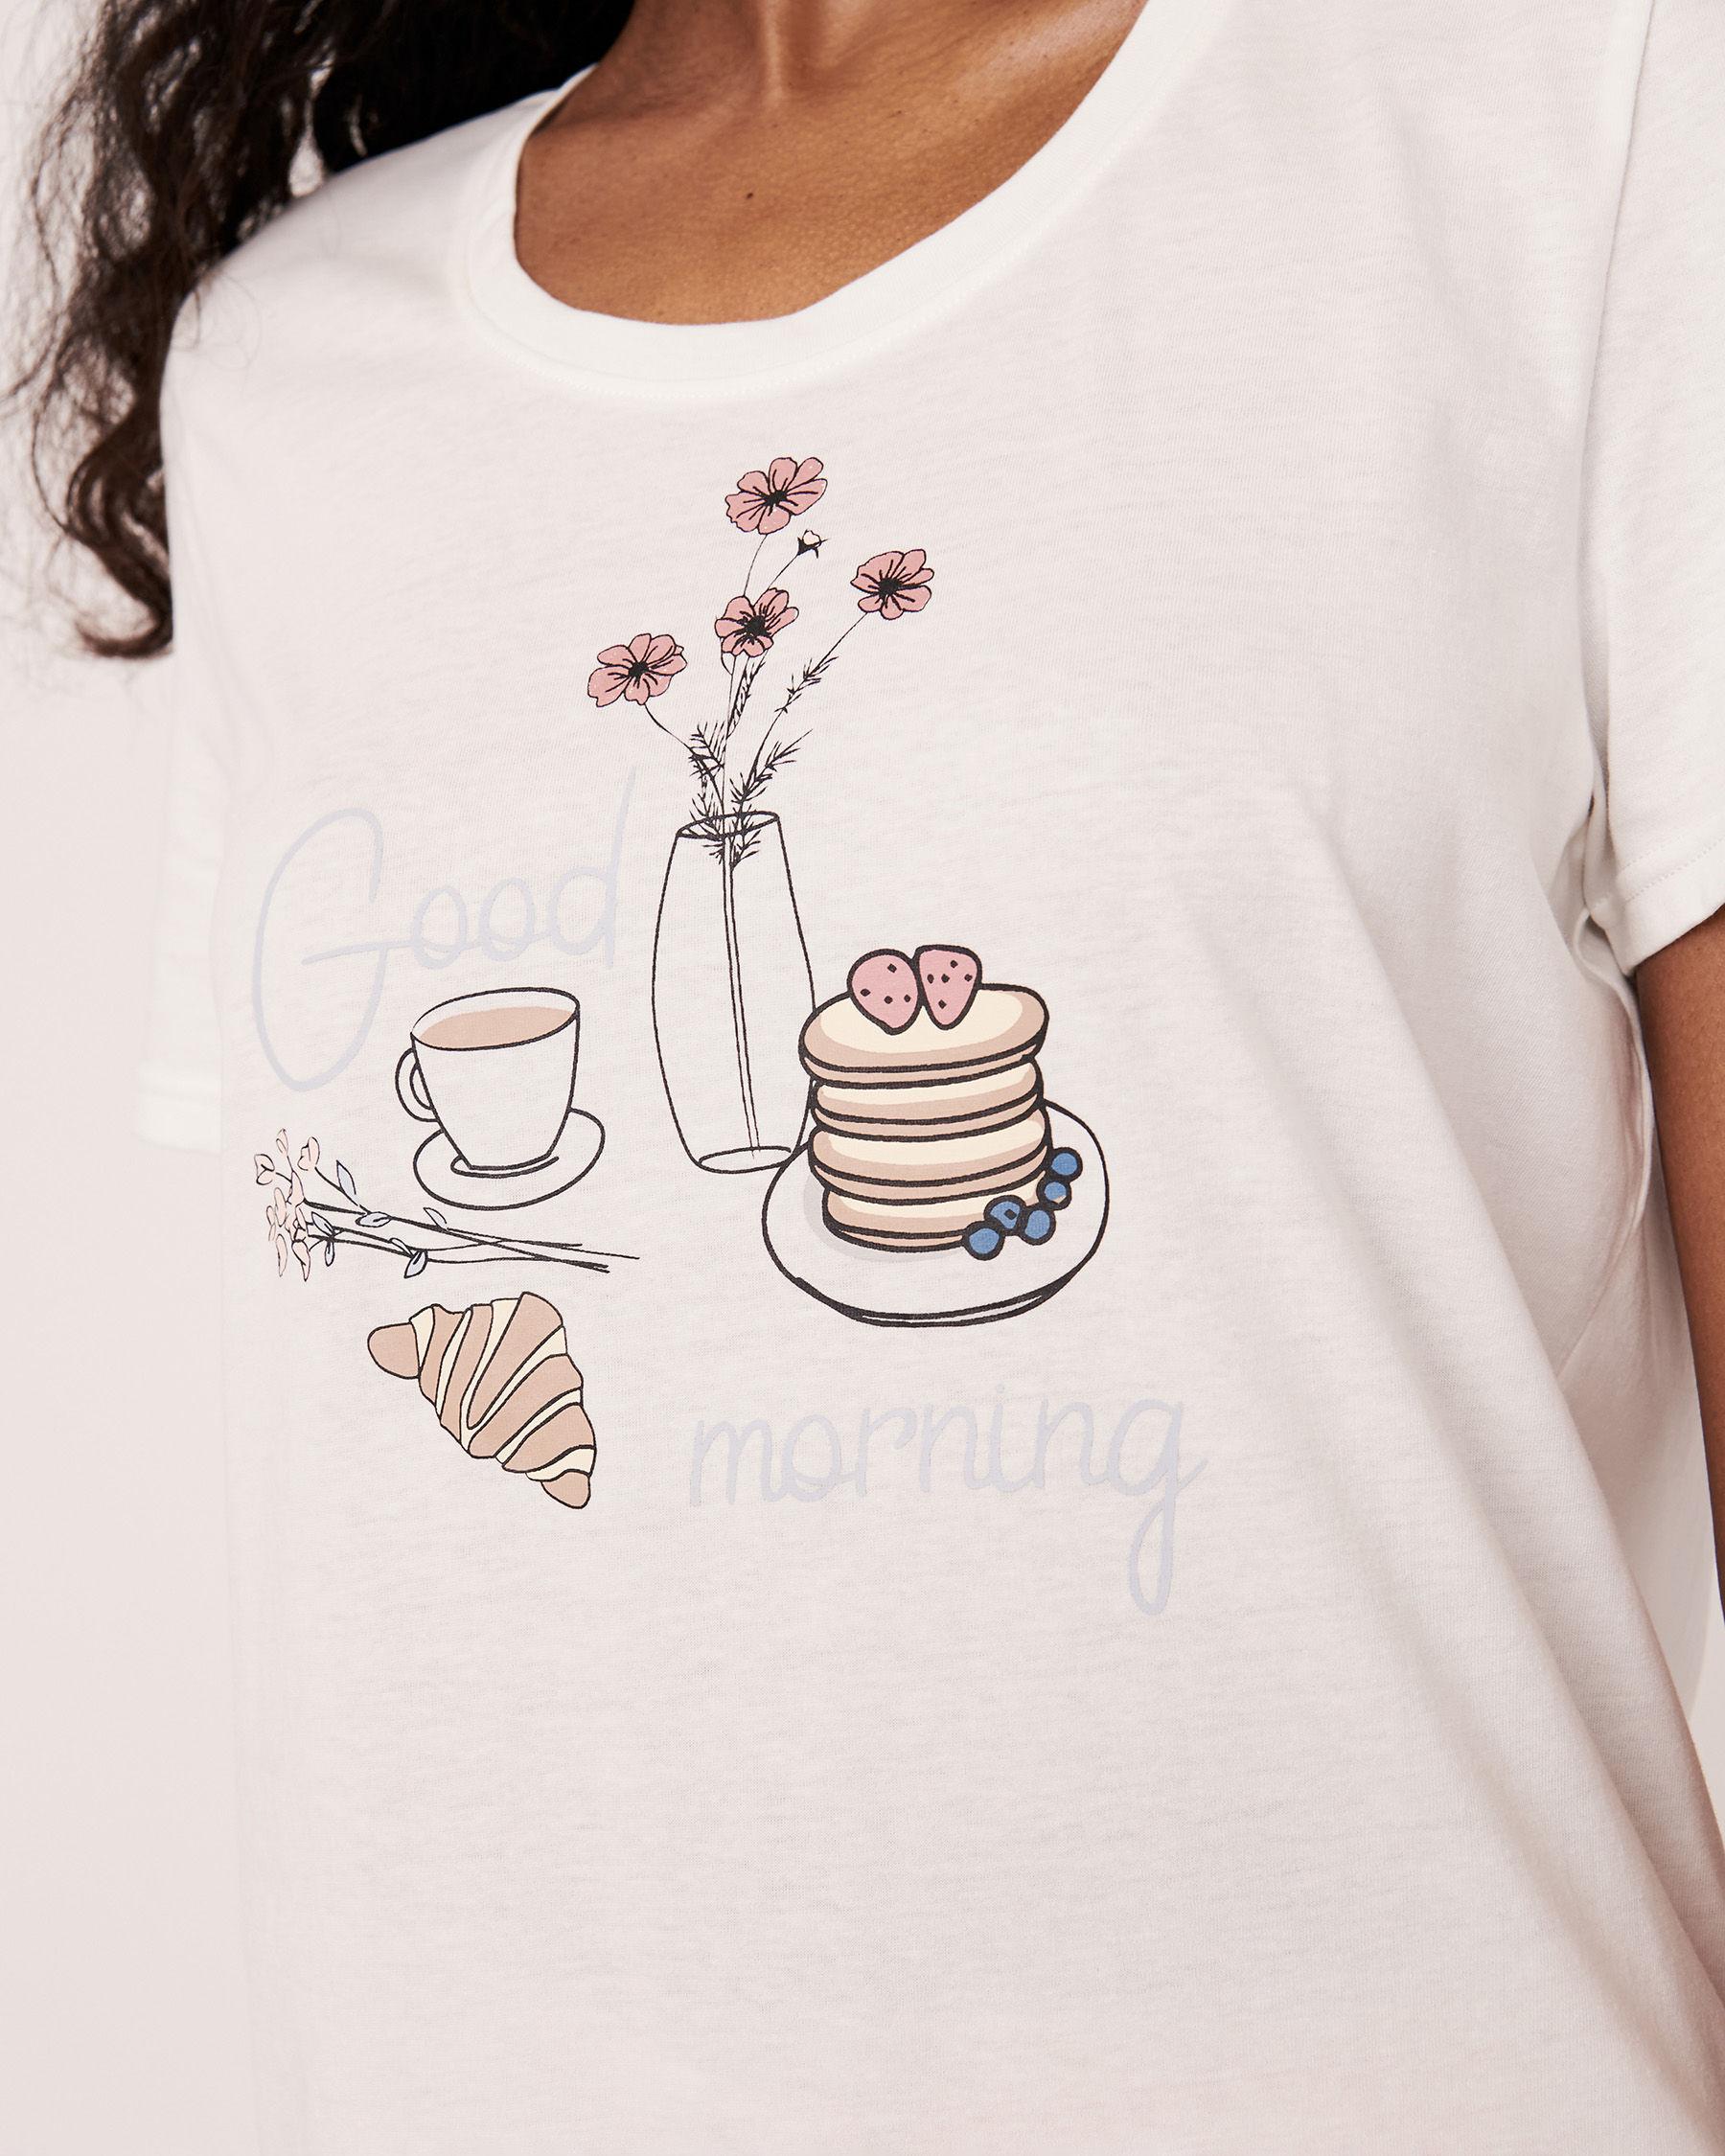 LA VIE EN ROSE Scoop Neckline T-shirt White 40100104 - View1